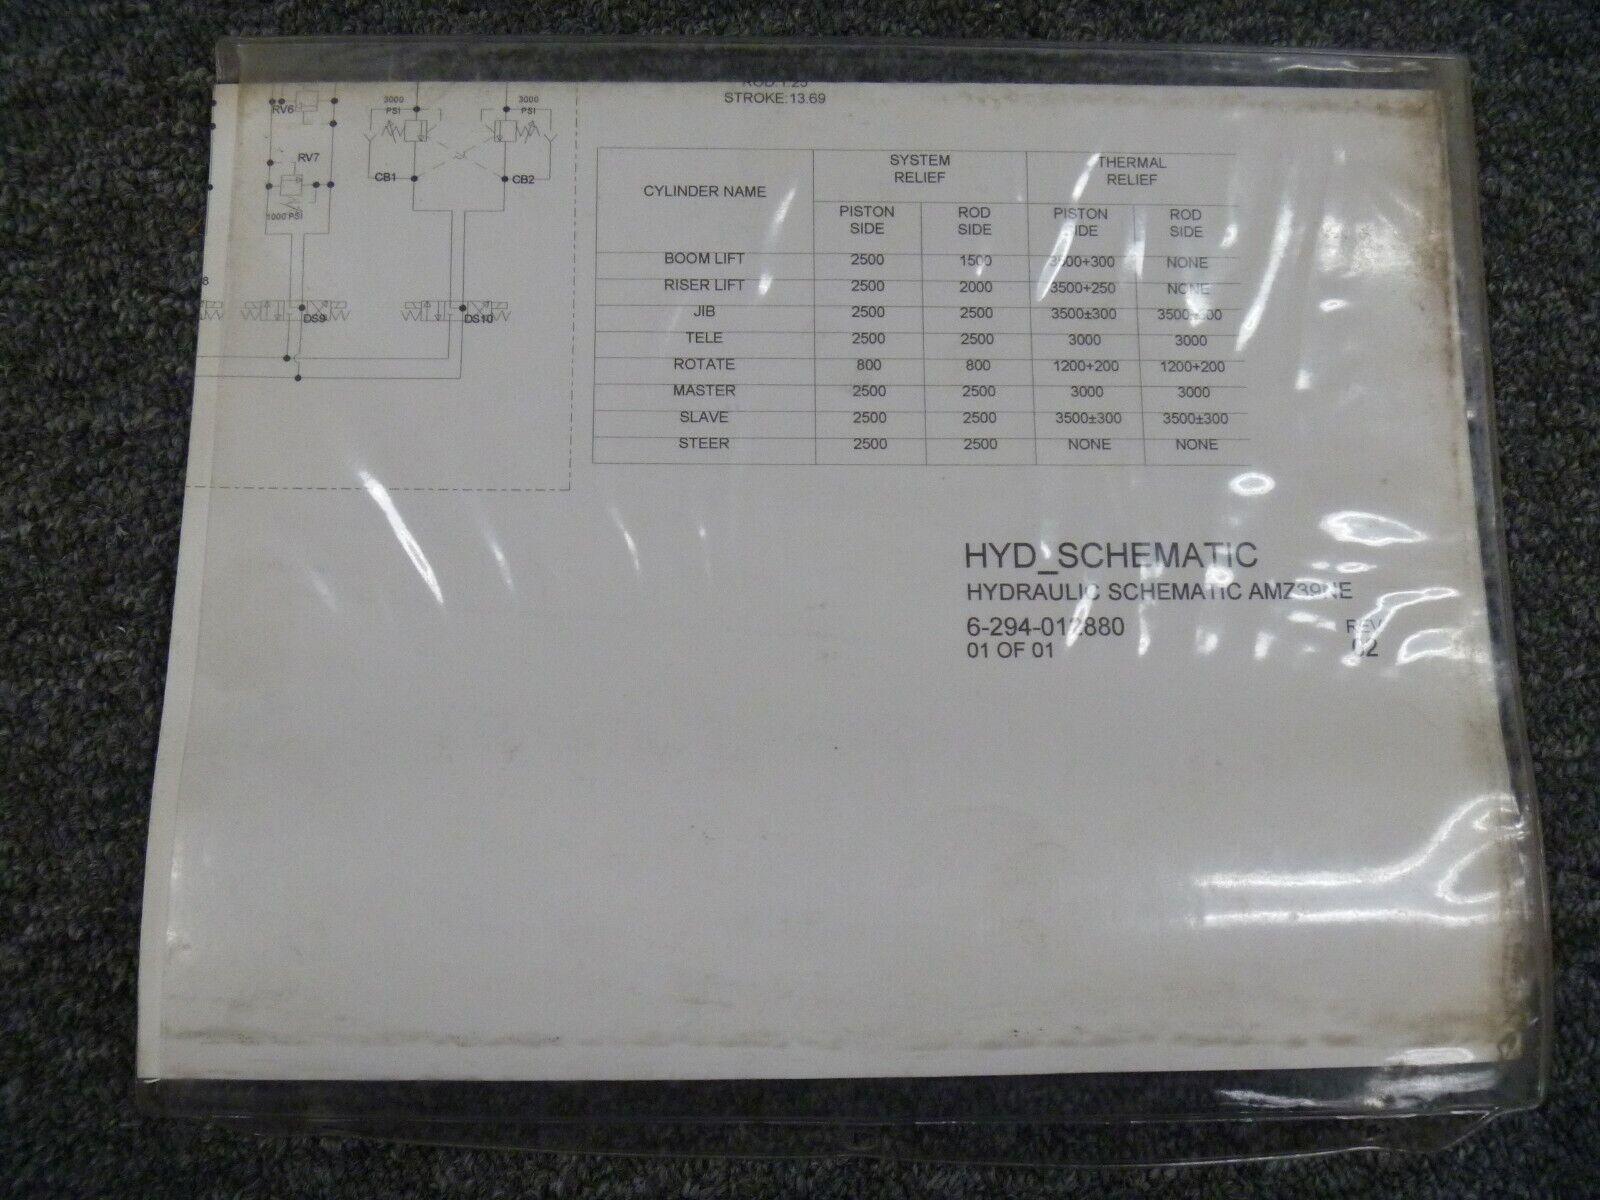 Grove AMZ40E AMZ40NE Aerial Lift Hydraulic Schematic Diagram ...